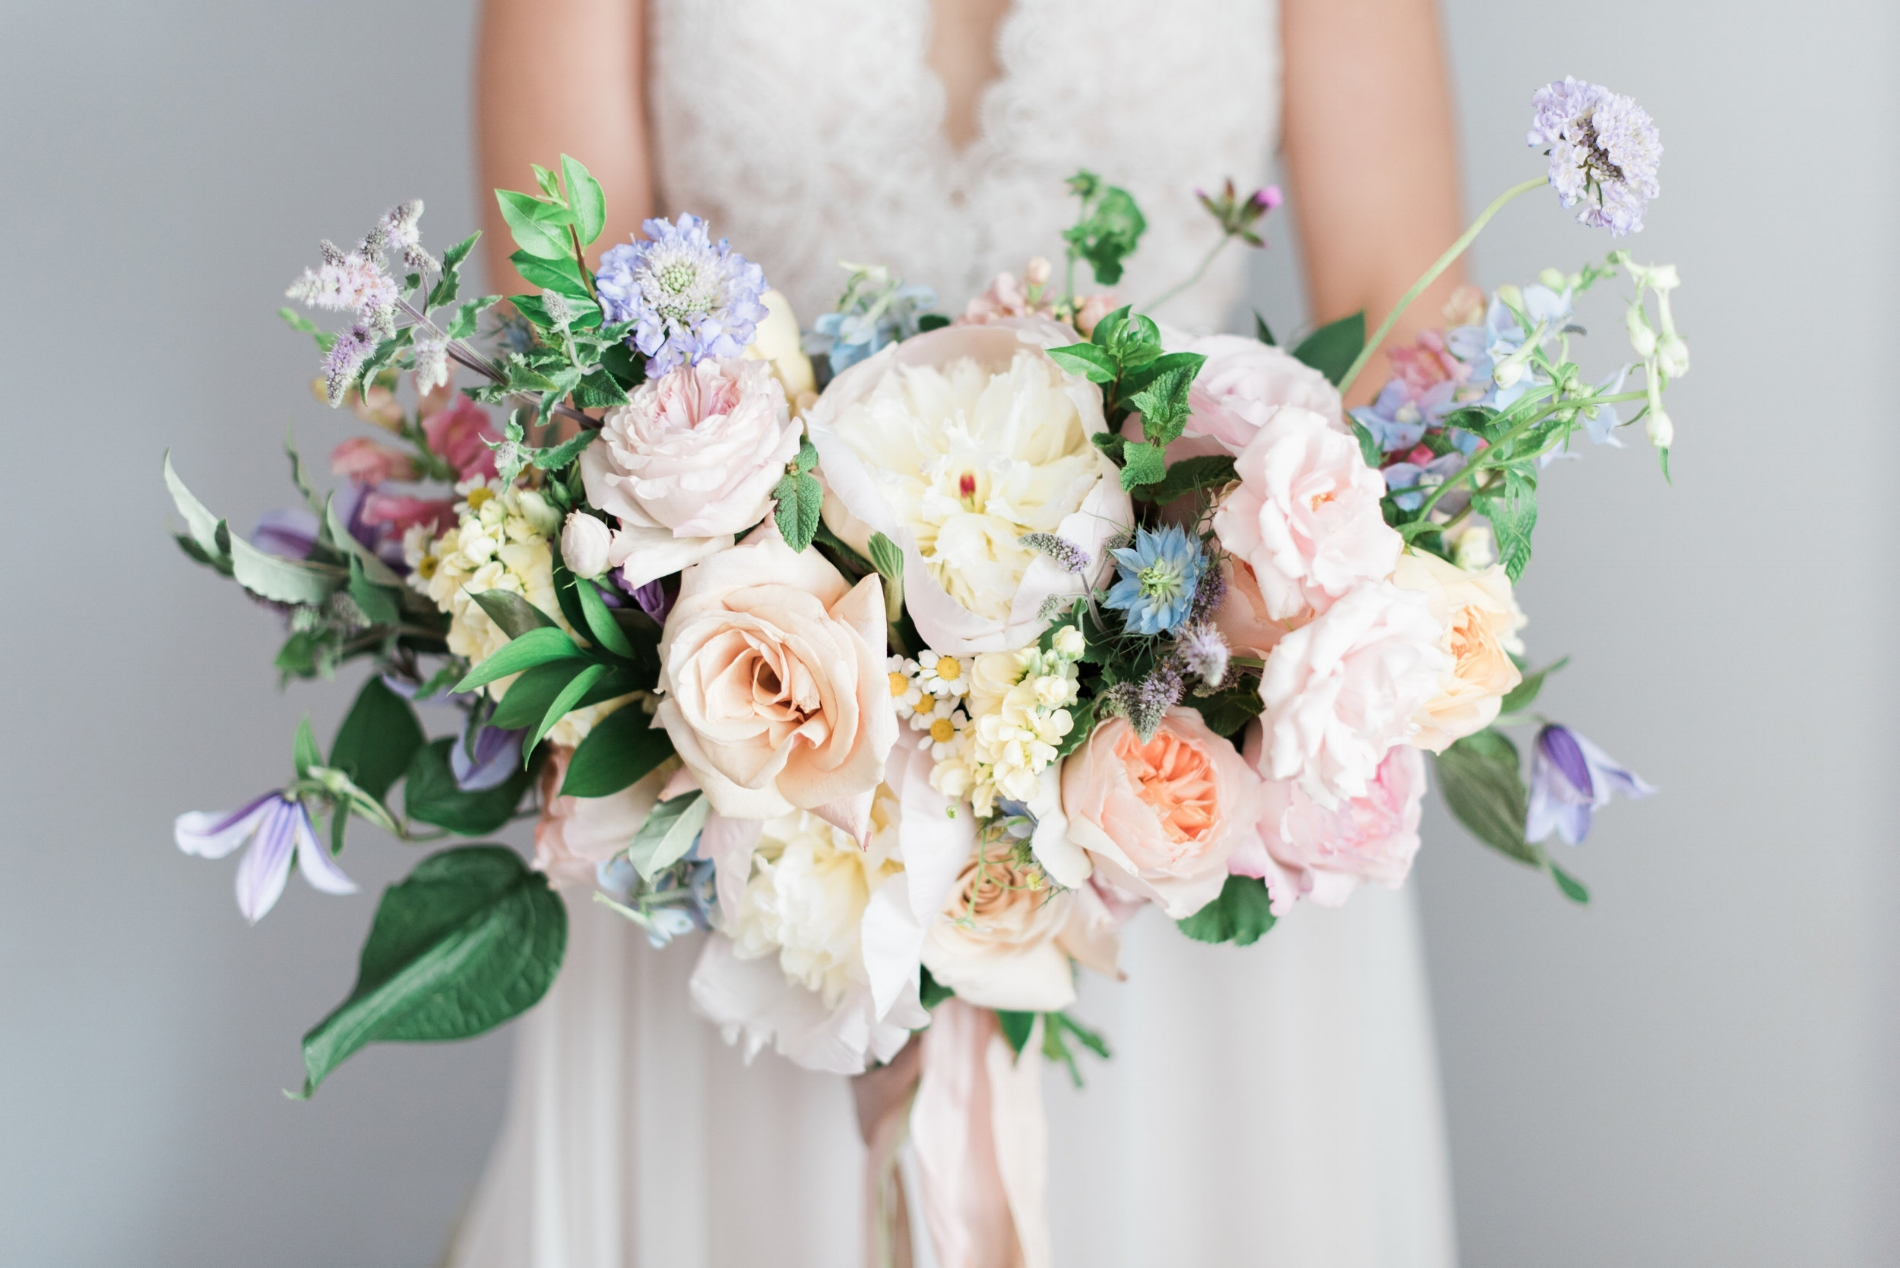 Bridal bouquet garden rose peonies clematis purple scabiosa.jpg